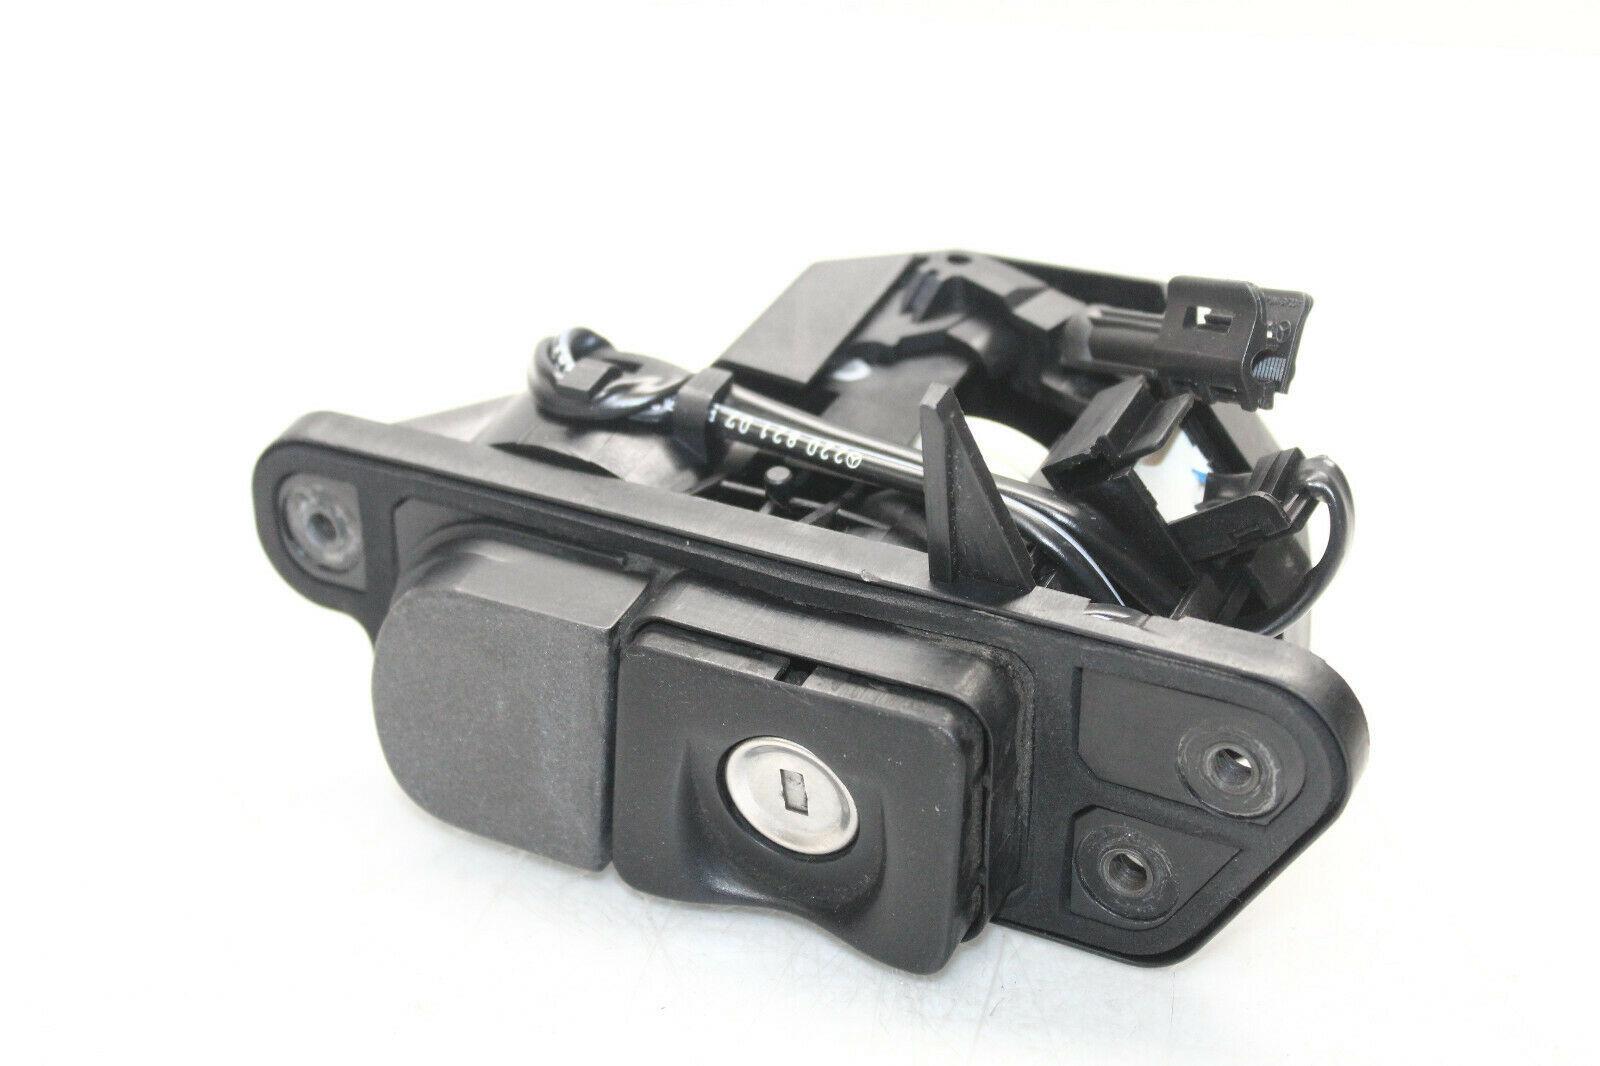 2000-2002 MERCEDES BENZ W220 S430 S500 REAR TRUNK RELEASE SWITCH P4568 - $88.20